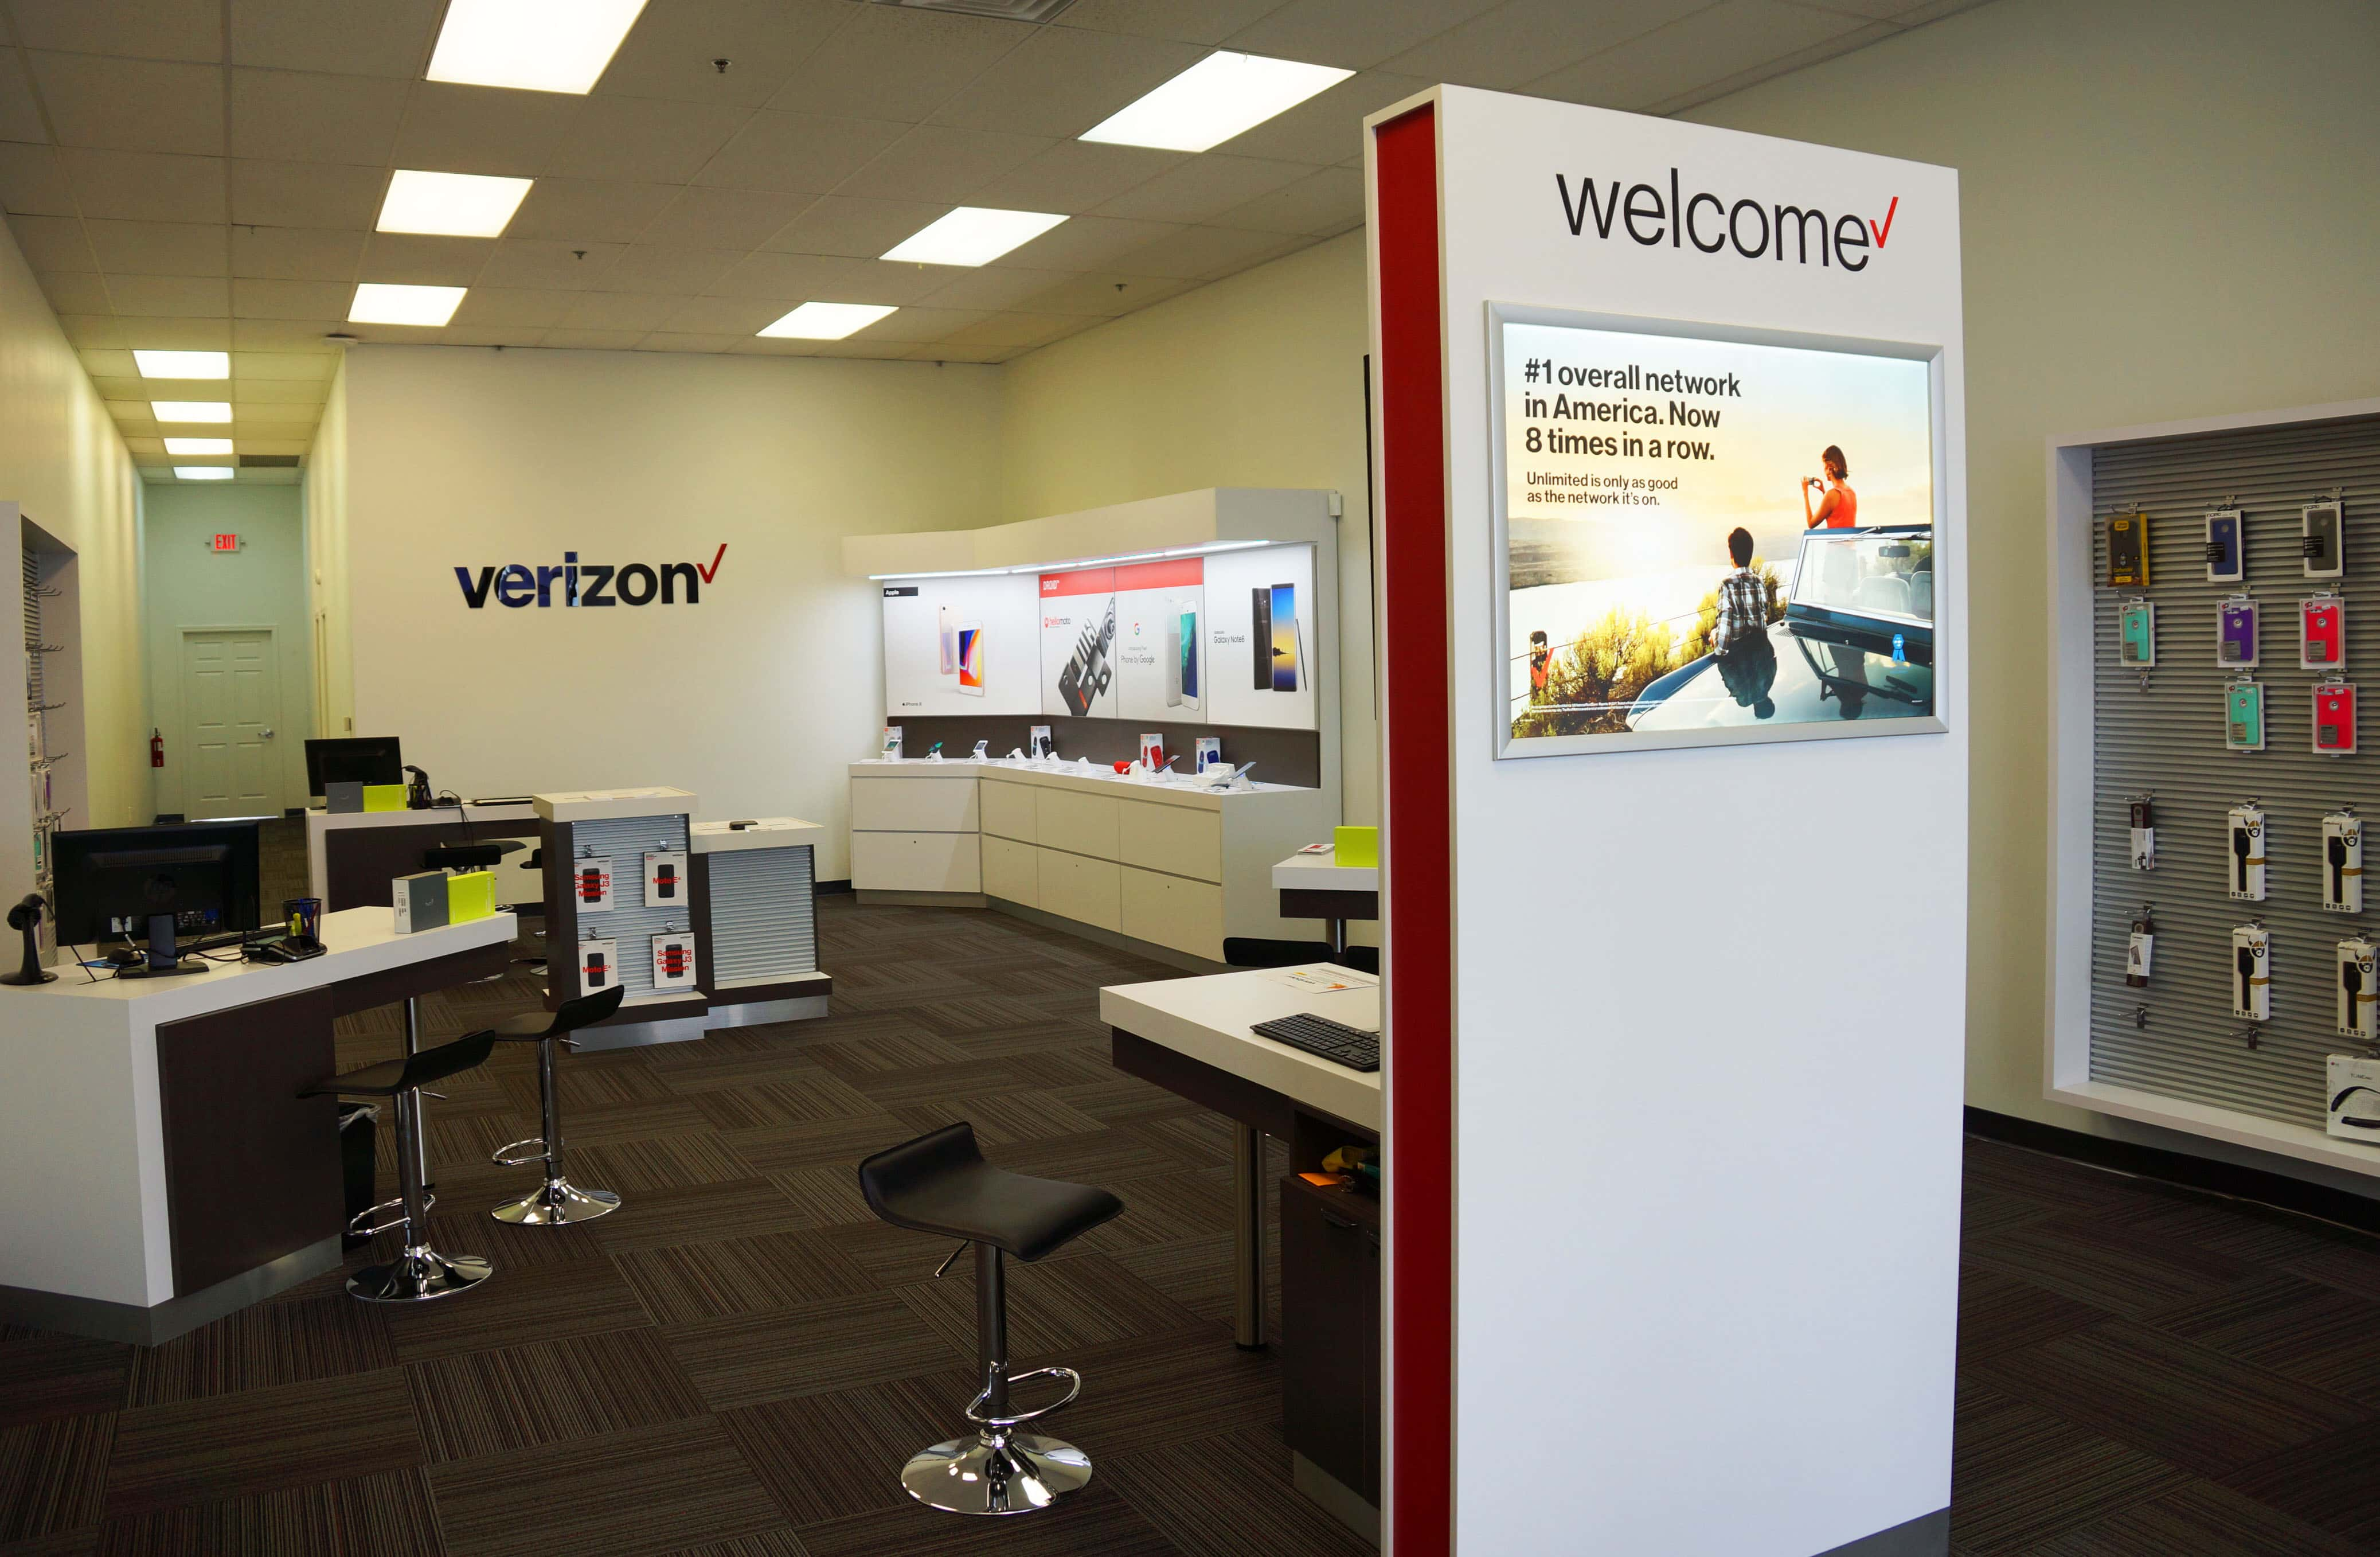 New Verizon Wireless Zone Sets Up Shop In Benton Harbor